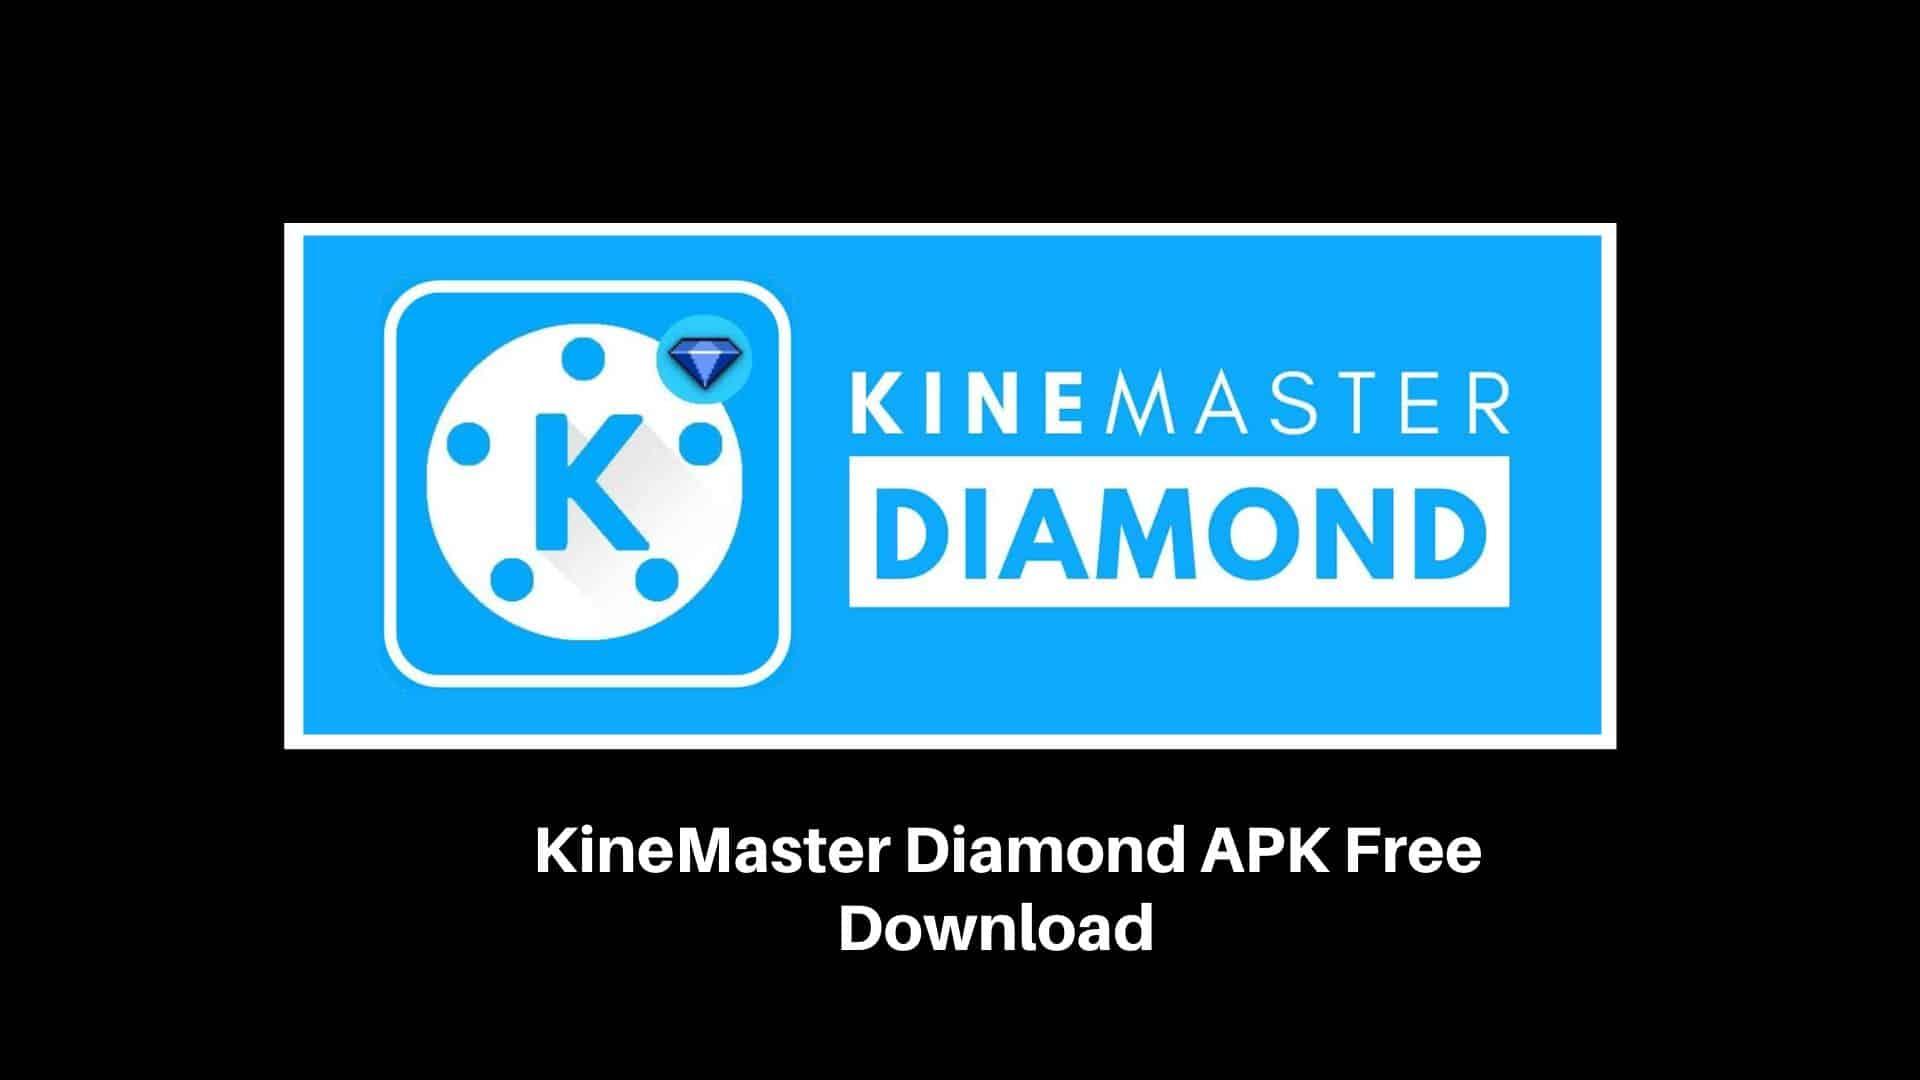 Pertanyaan-pertanyaan-seputar-Kinemaster-Diamond